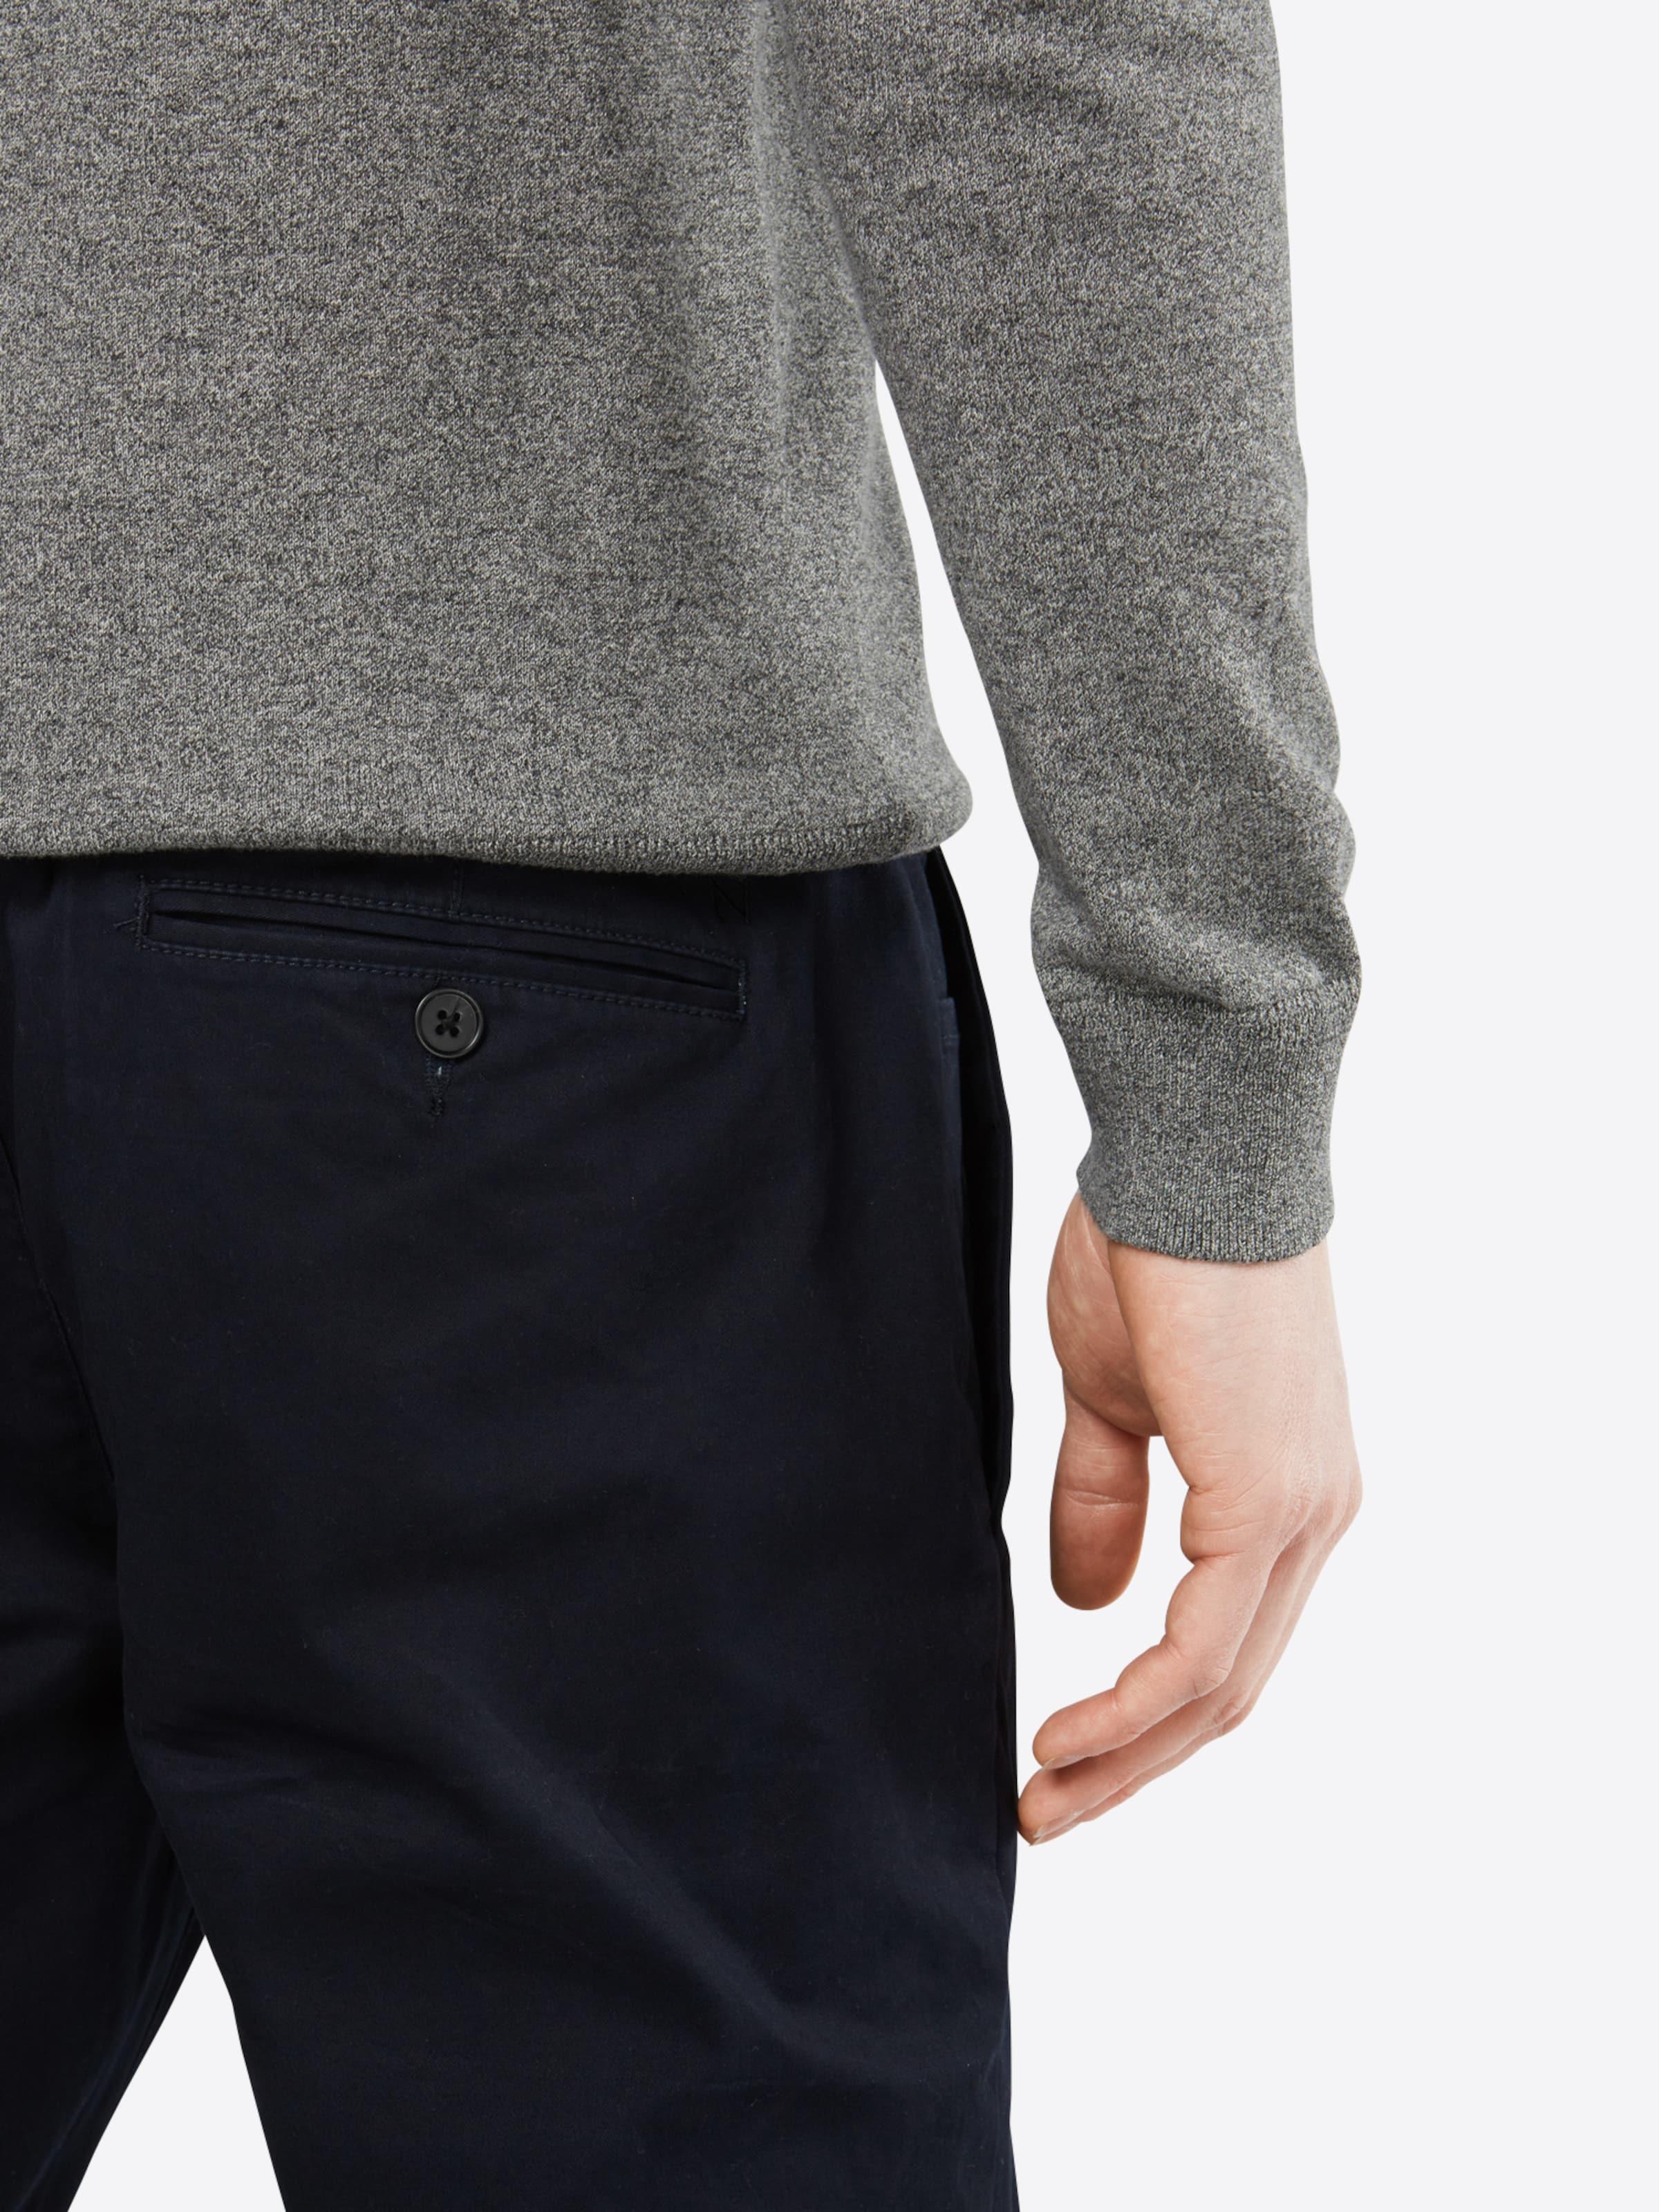 NOWADAYS Hose 'The Modern Pant' Großhandel Qualität Offizielle Online Fälschung Günstiger Preis L5GZxY1fk